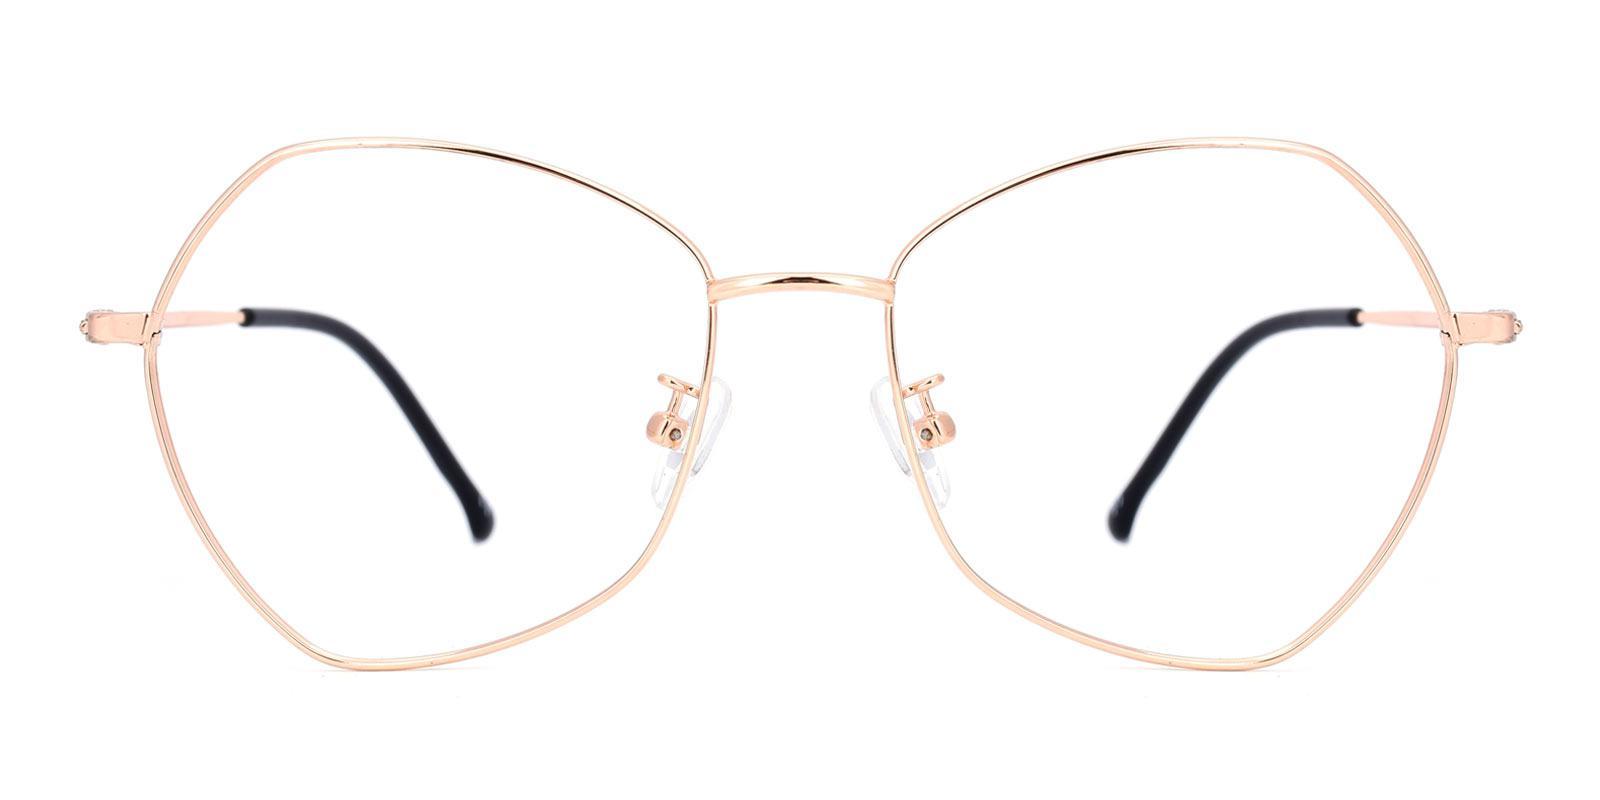 Compass-Gold-Geometric-Metal-Eyeglasses-detail